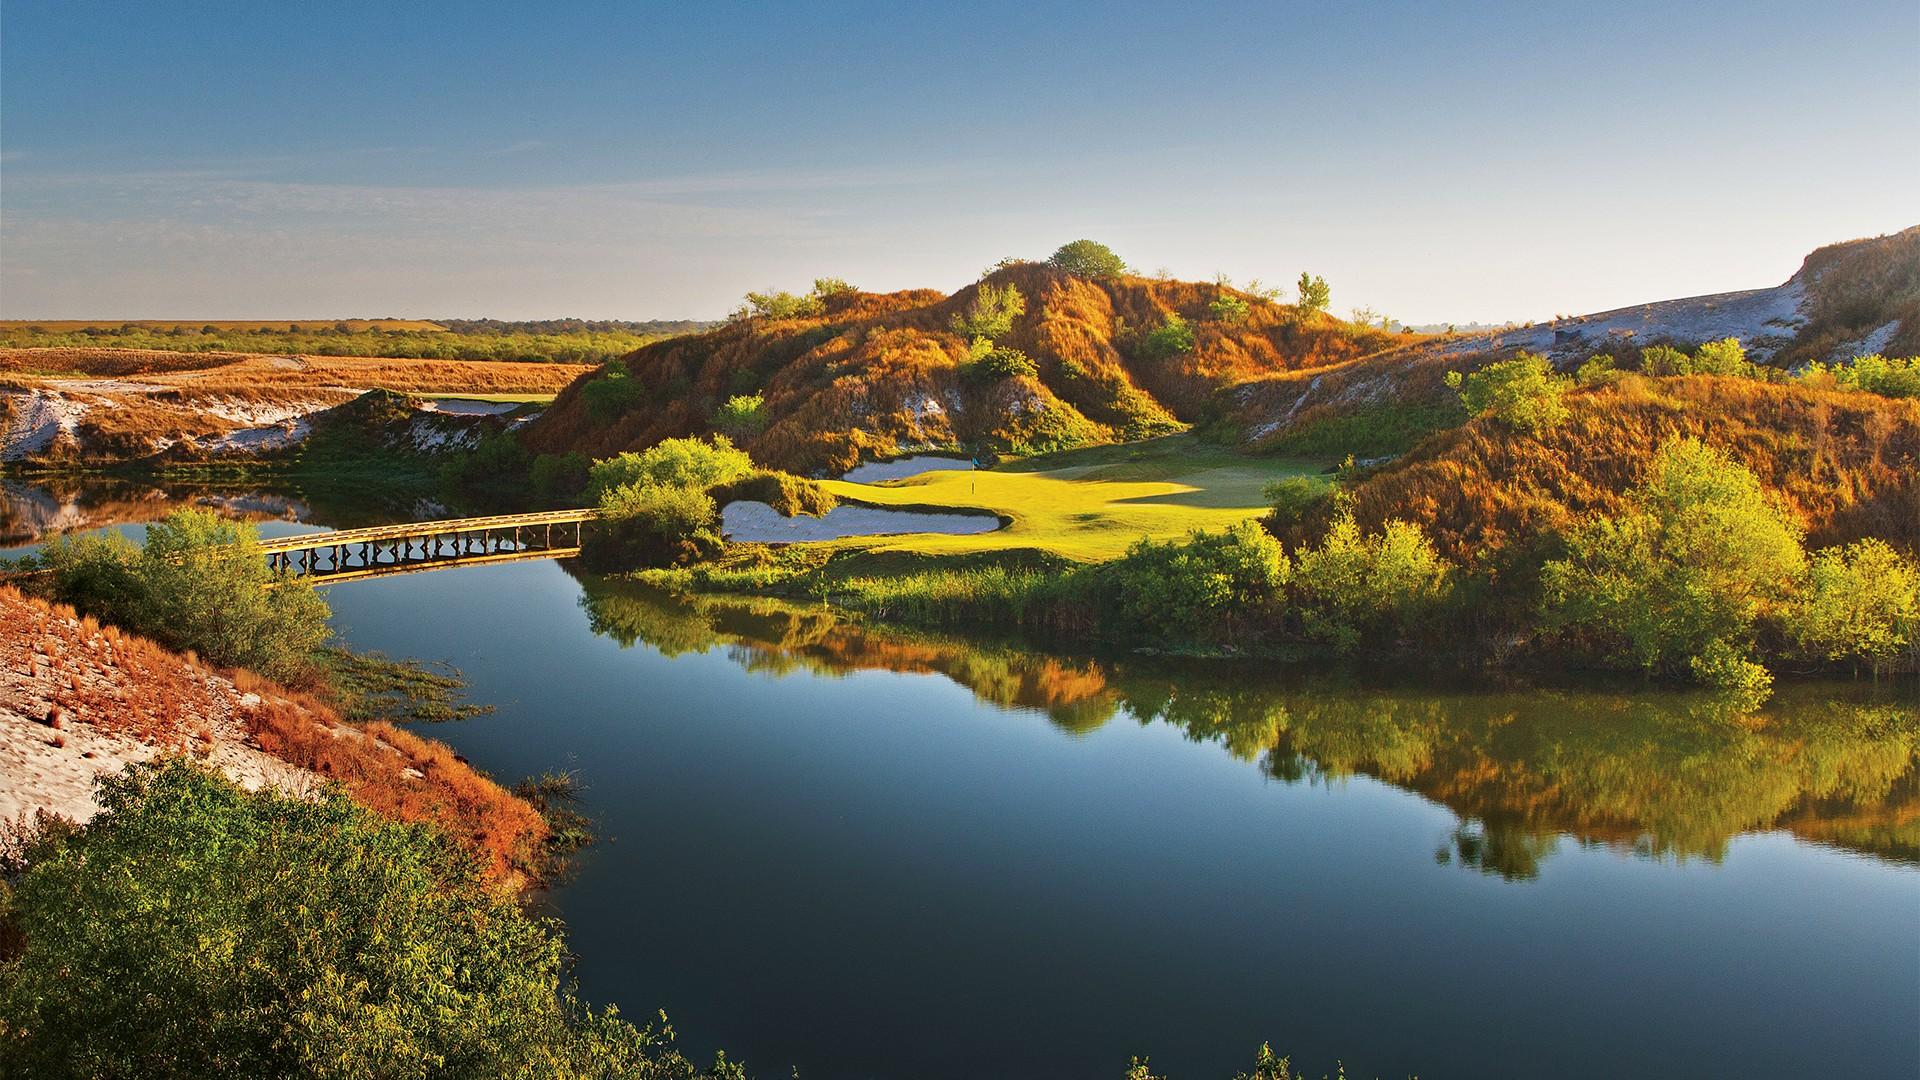 Streamsong Resort, Blue Course, Tom Doak, Hole 7